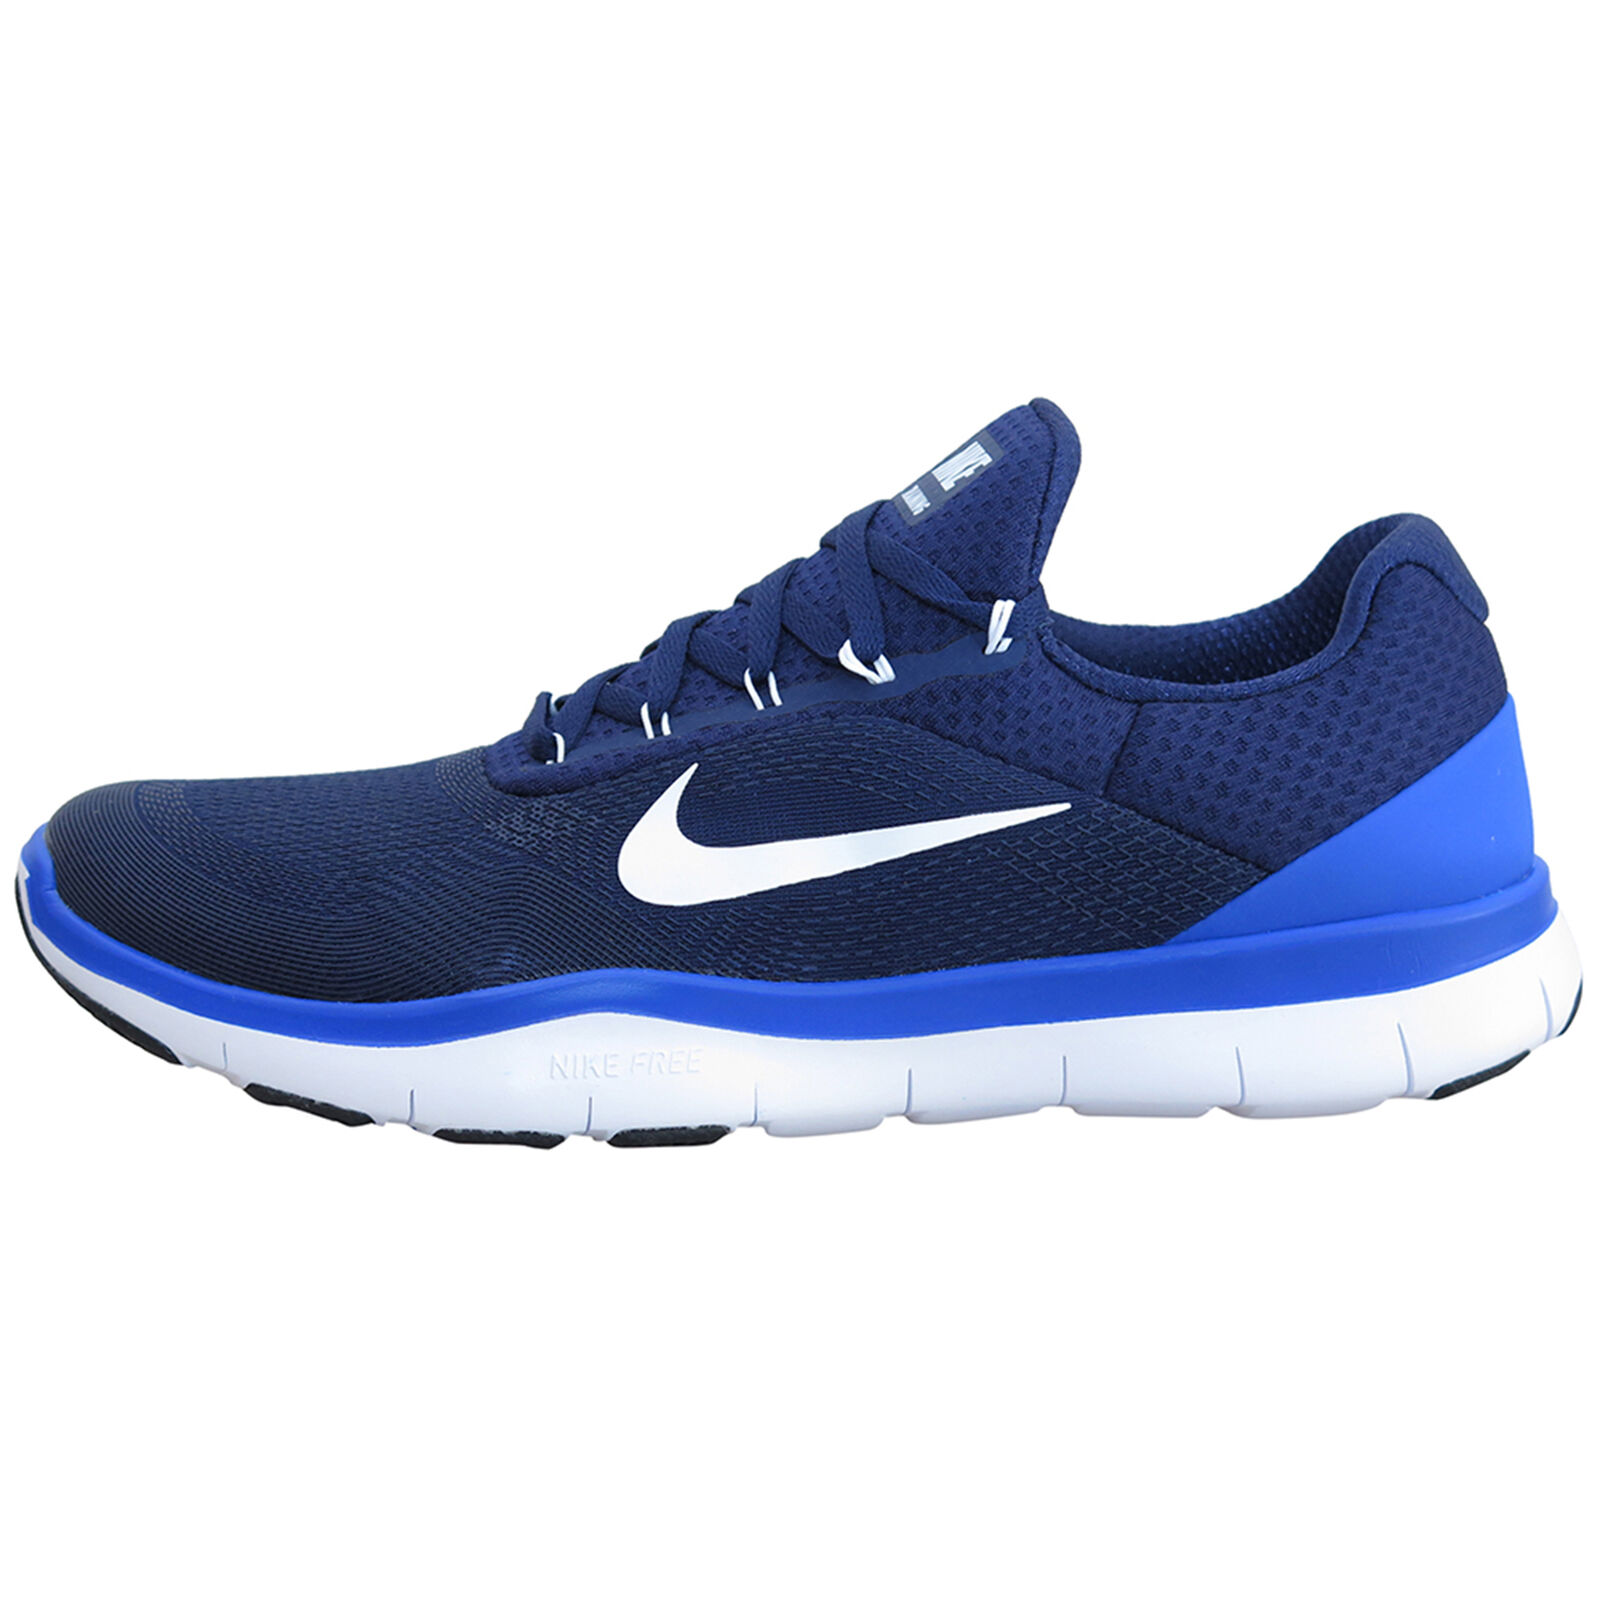 Nike Free entrenador v7 azul blancoo 898053-400